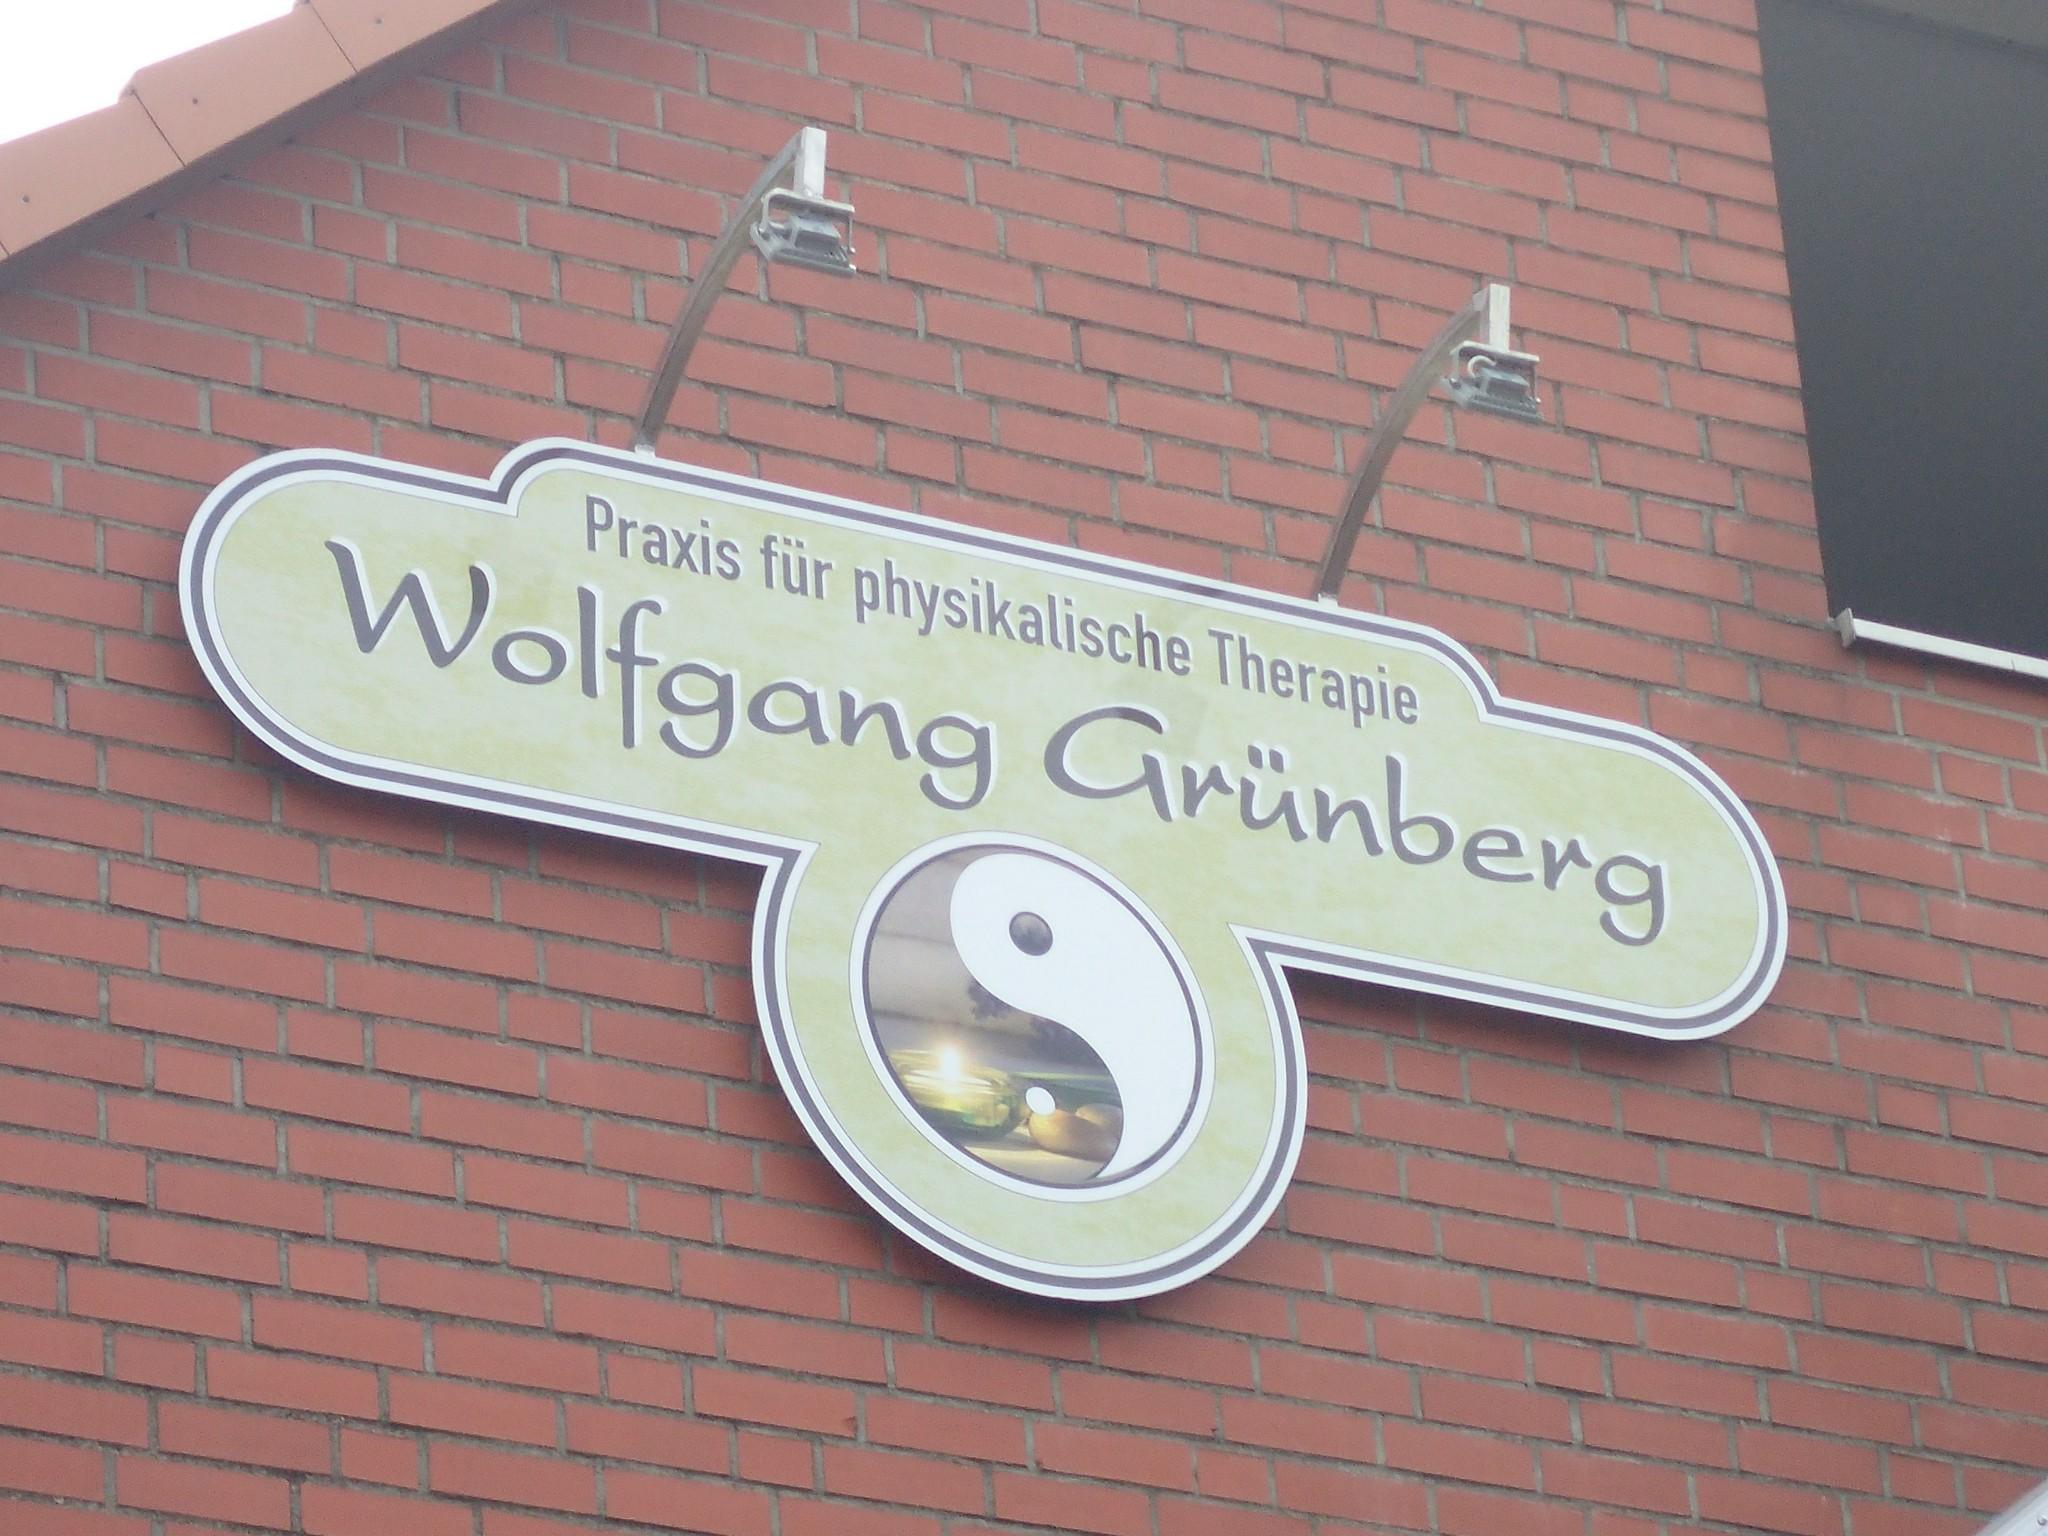 Gruenberg-Praxis-1